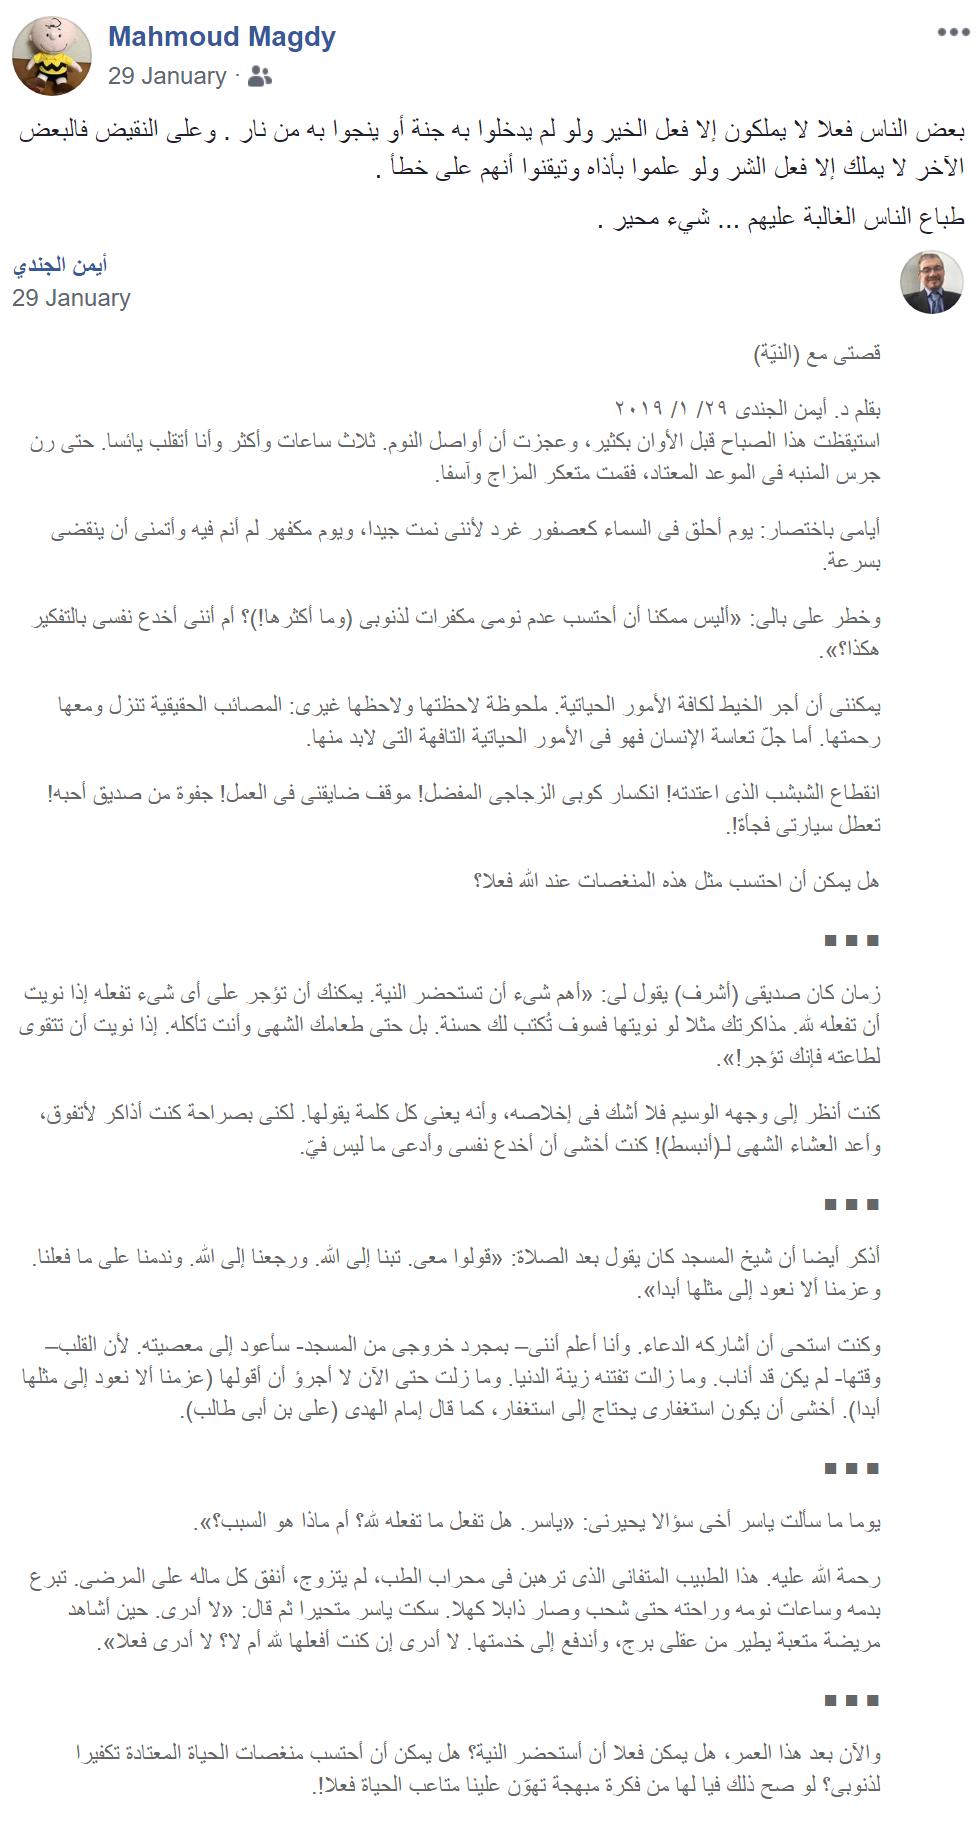 Pin By Mahmoud H Elshenawy On قراءات